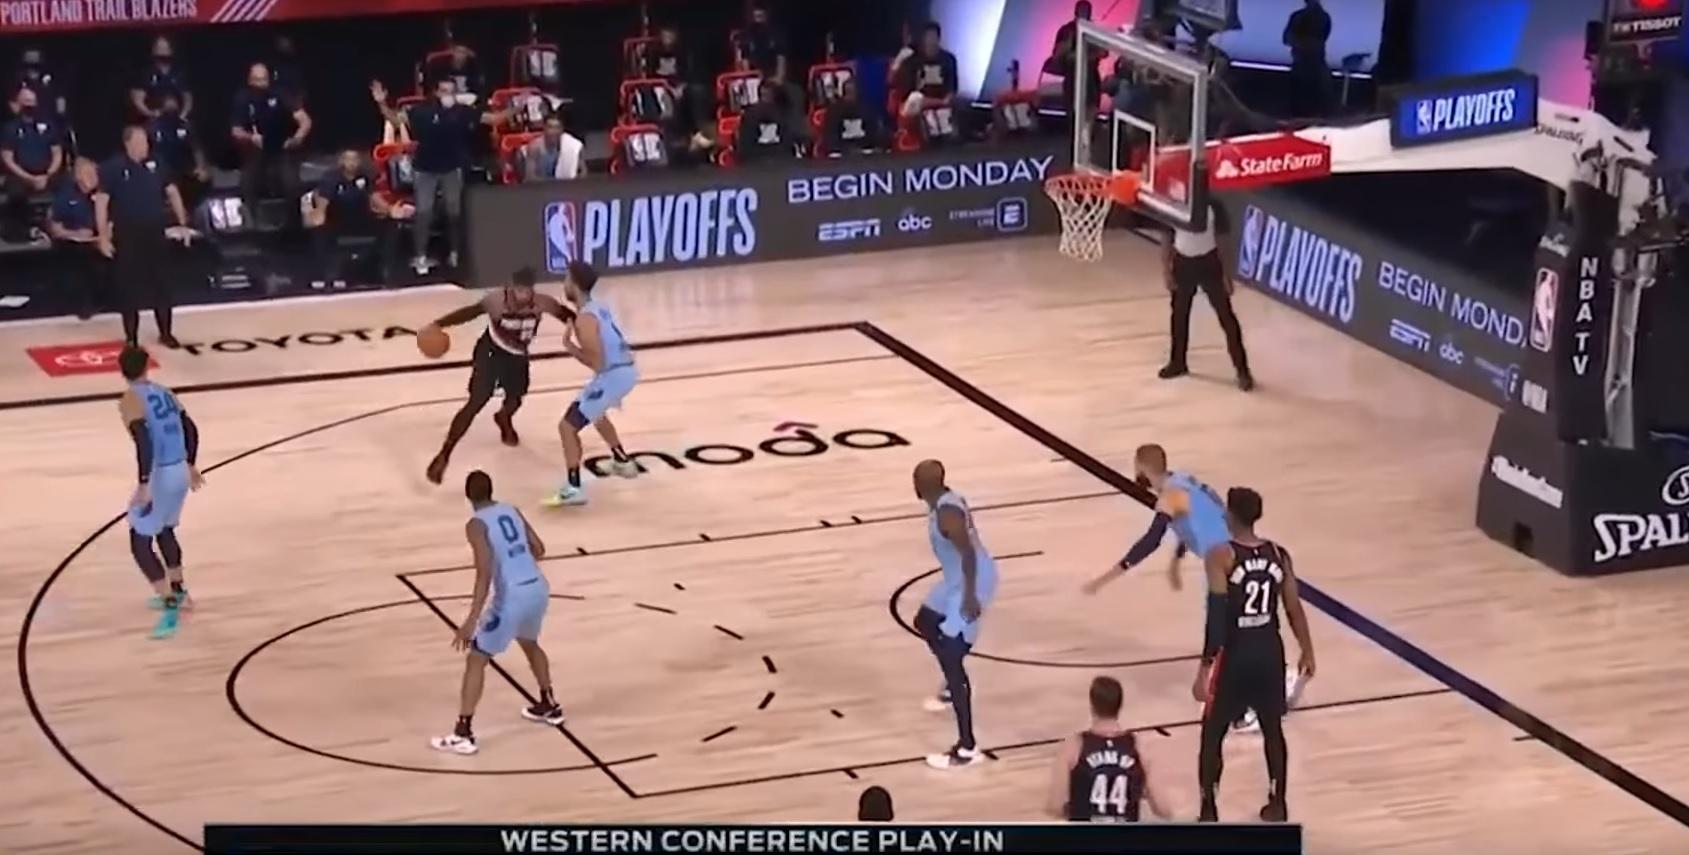 ставка на баскетбол по стратегии зигзаг